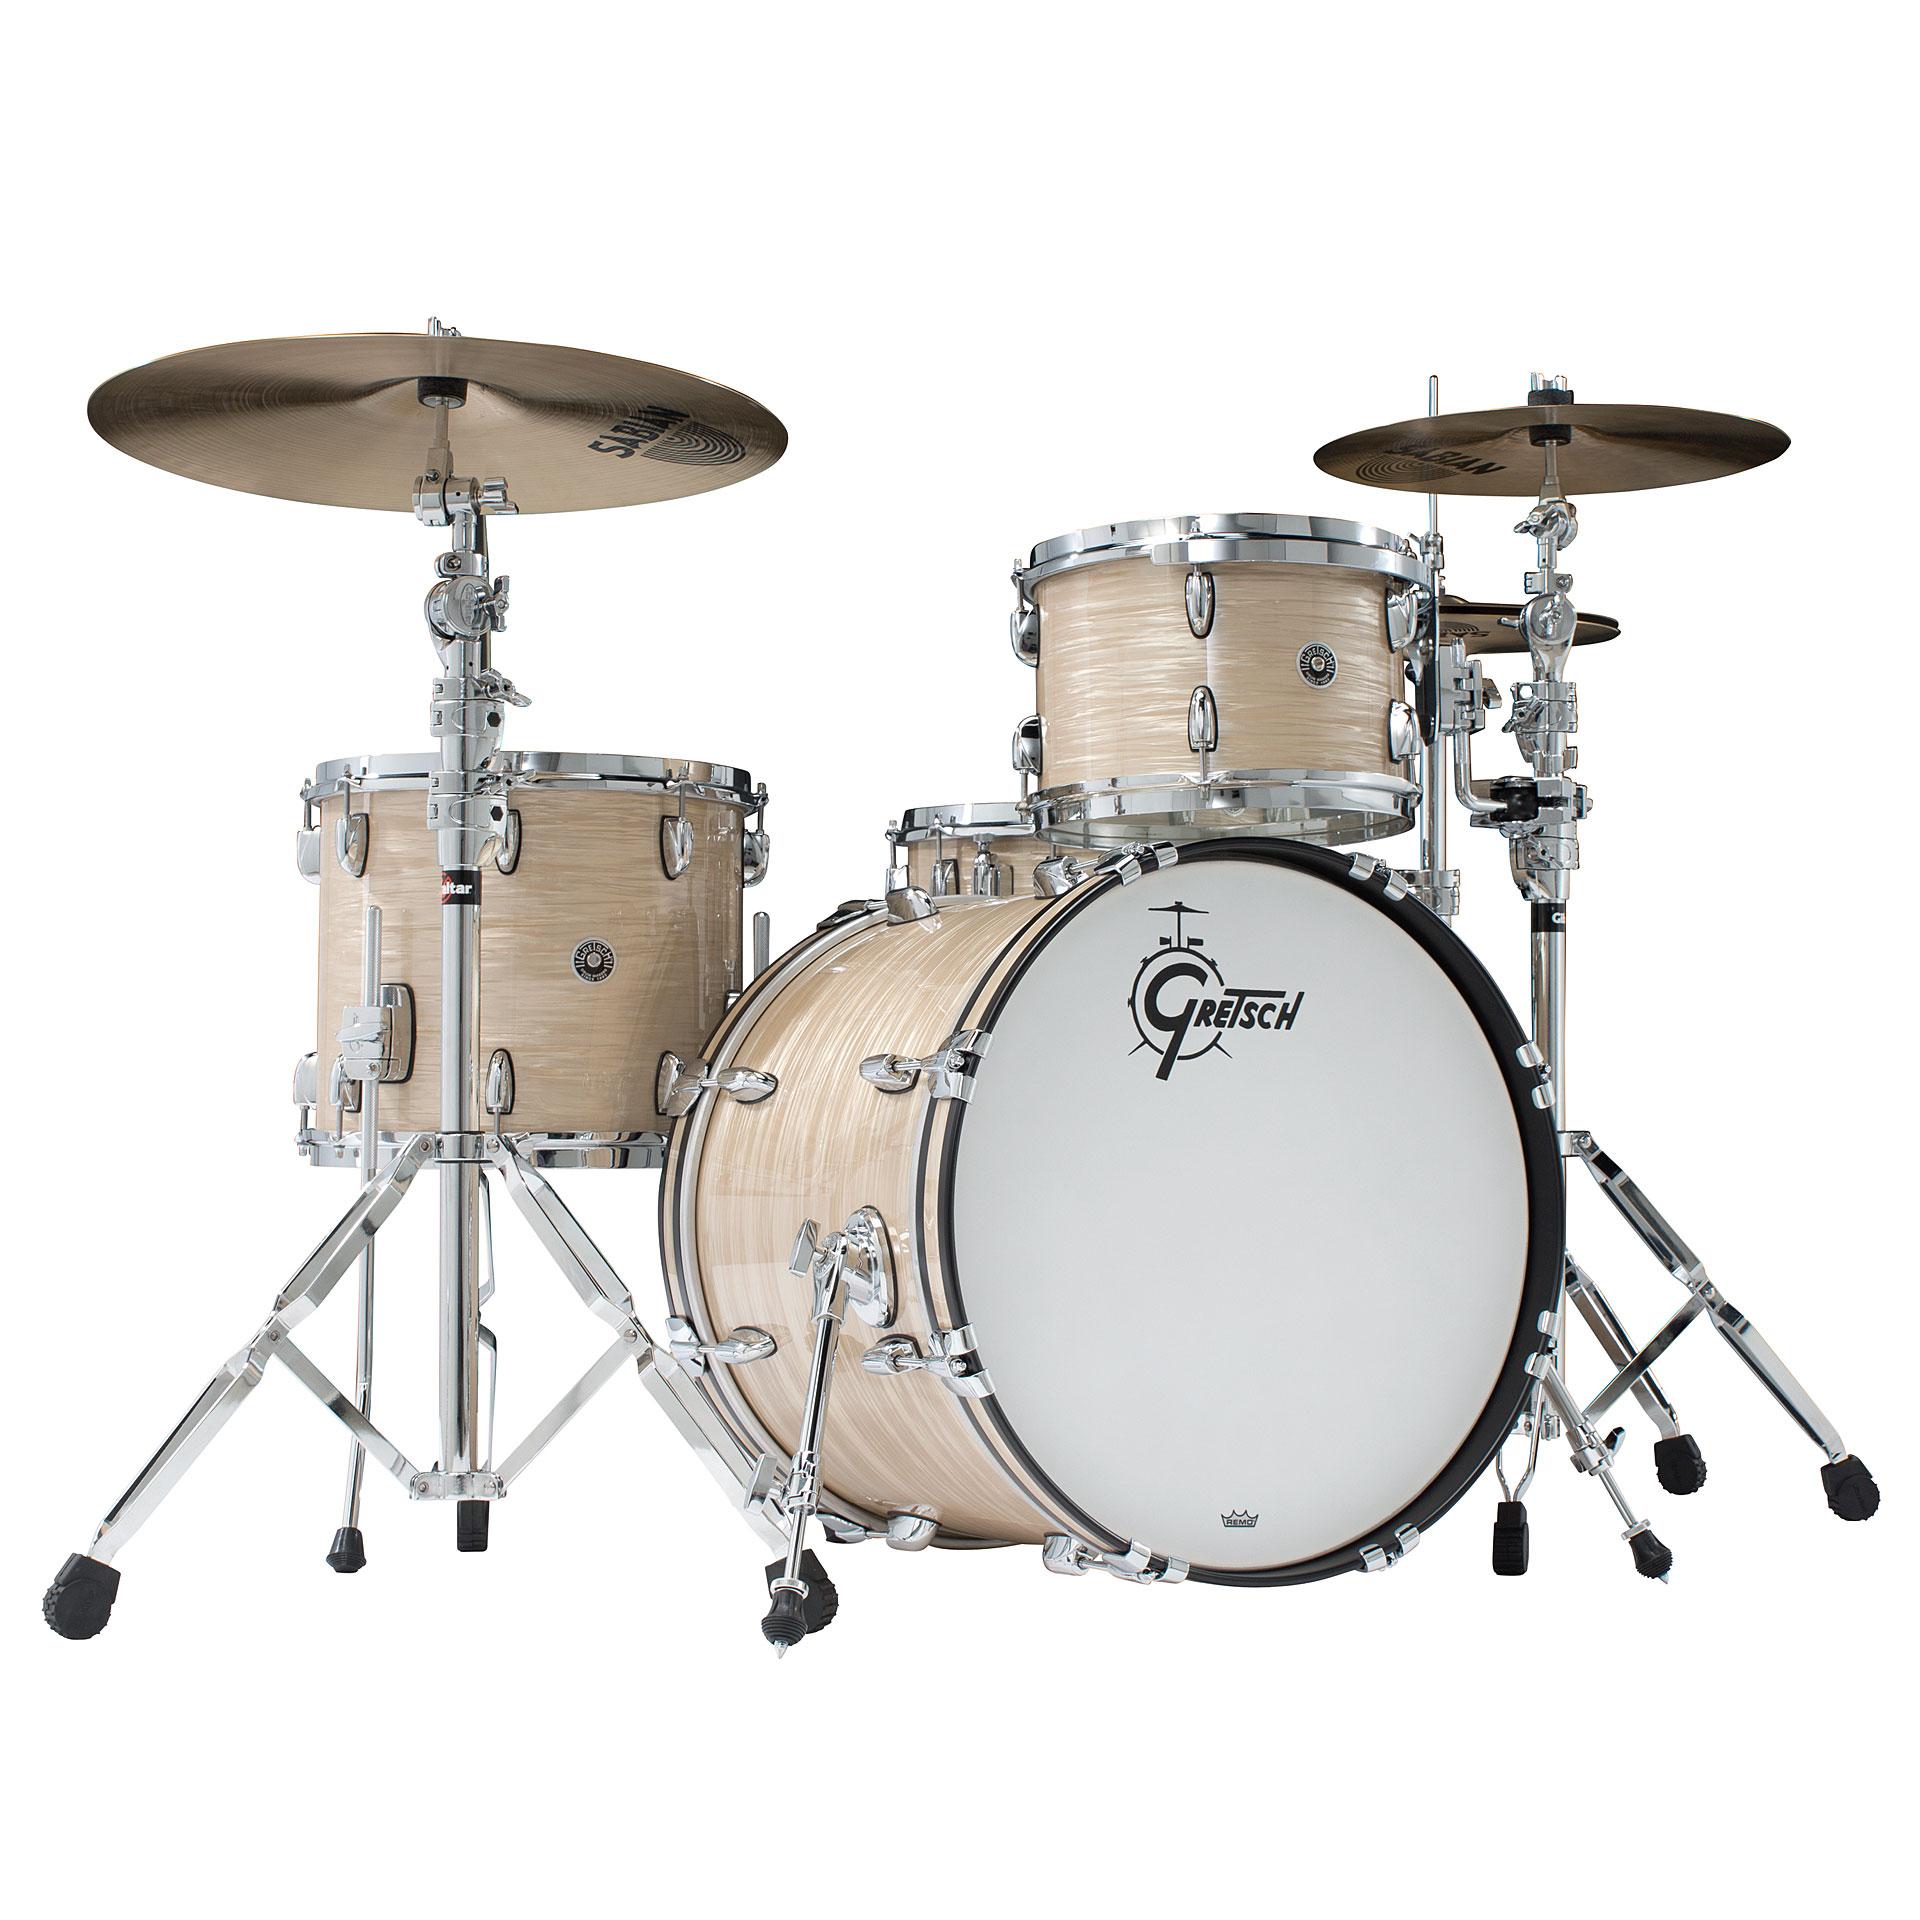 6df63557369c ... Drum Kit Gretsch Drums USA Brooklyn 20 Cream Oyster Drumset (2) ...